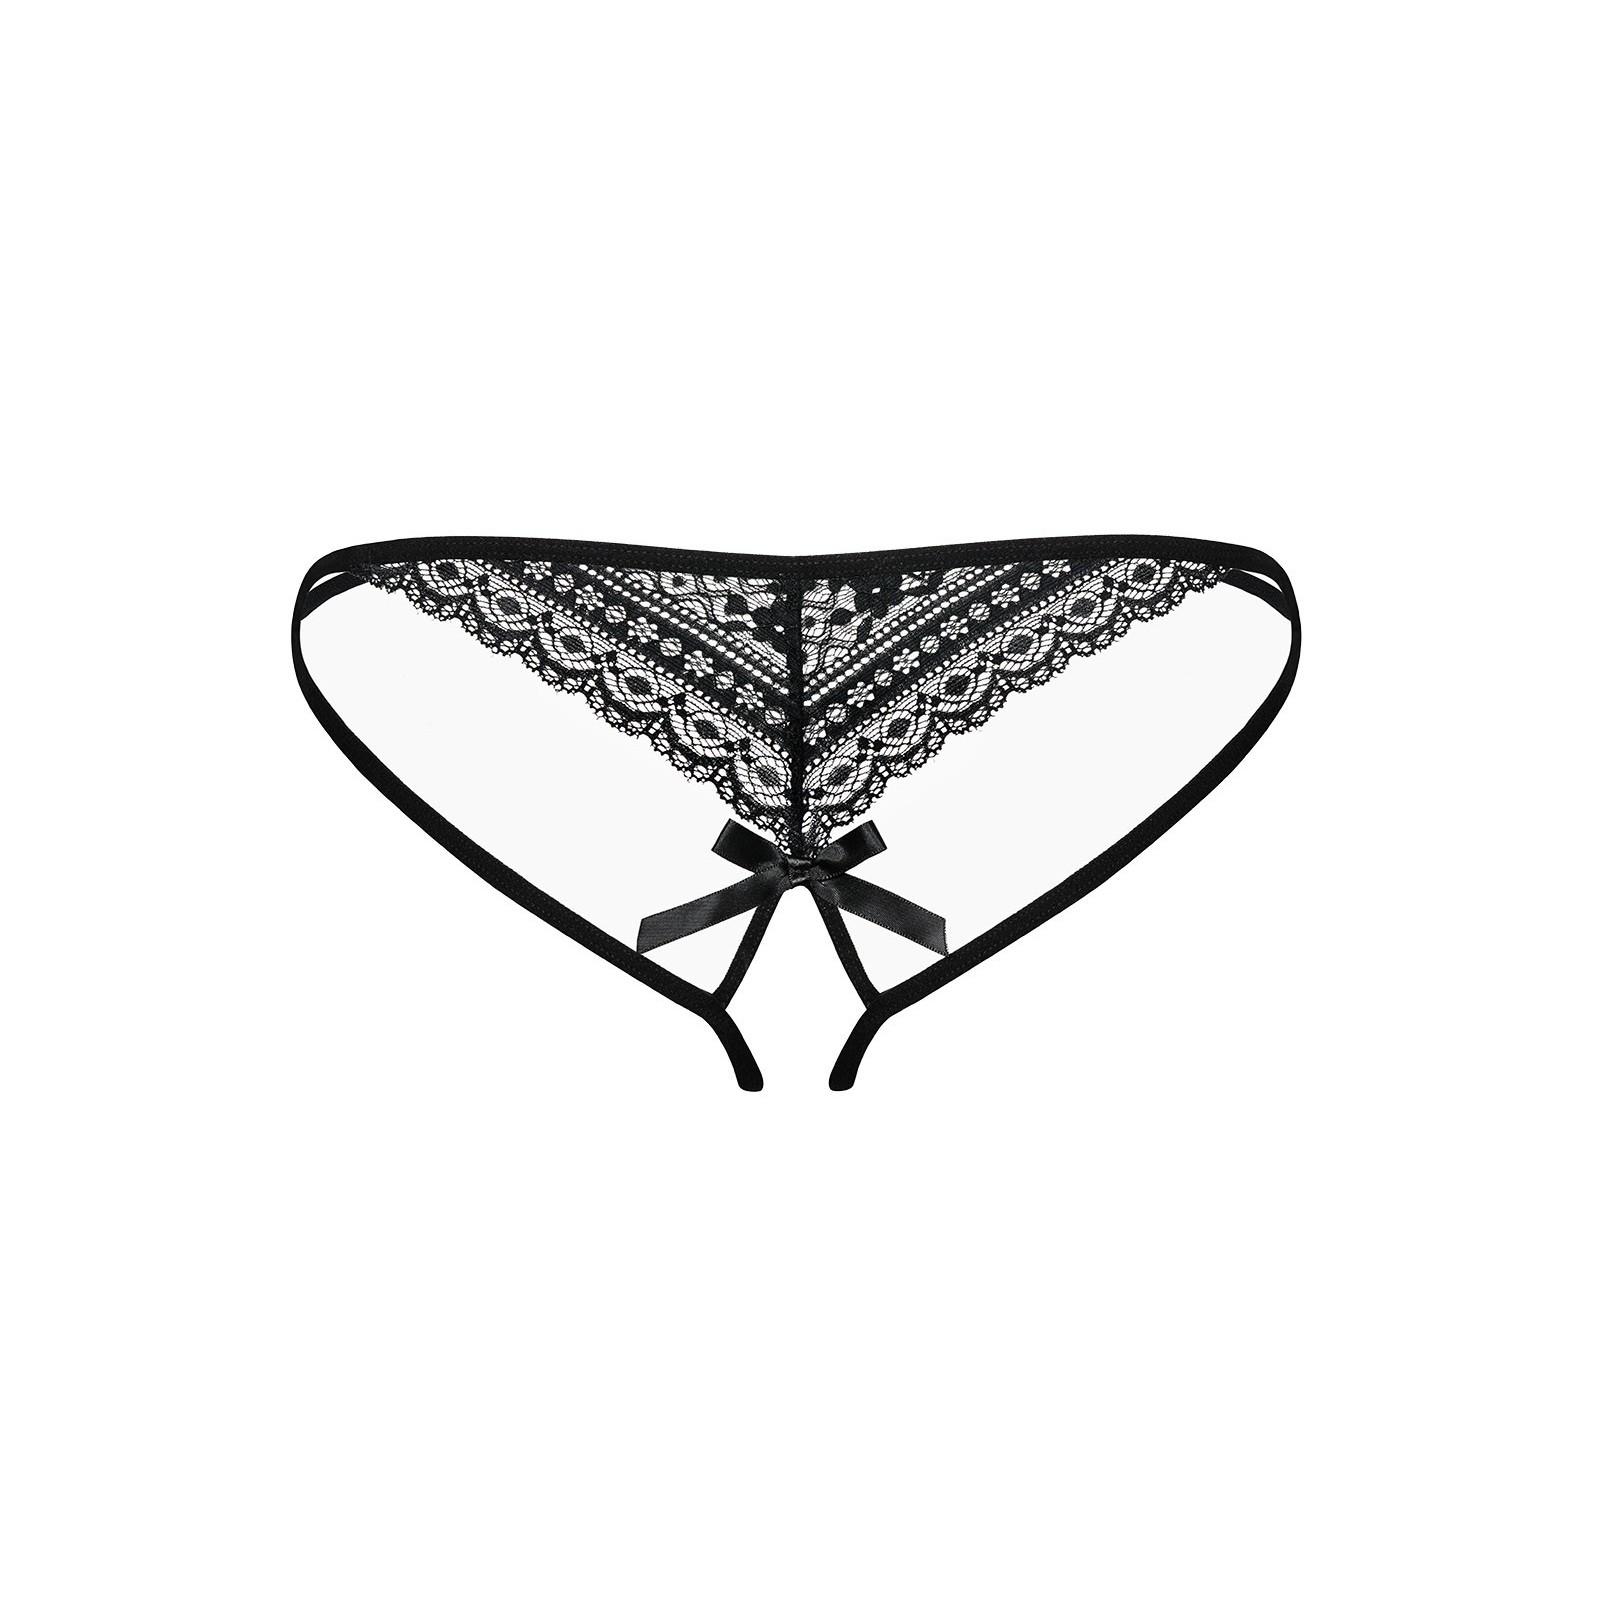 Picantina Crotchless Thong - 6 - Vorschaubild